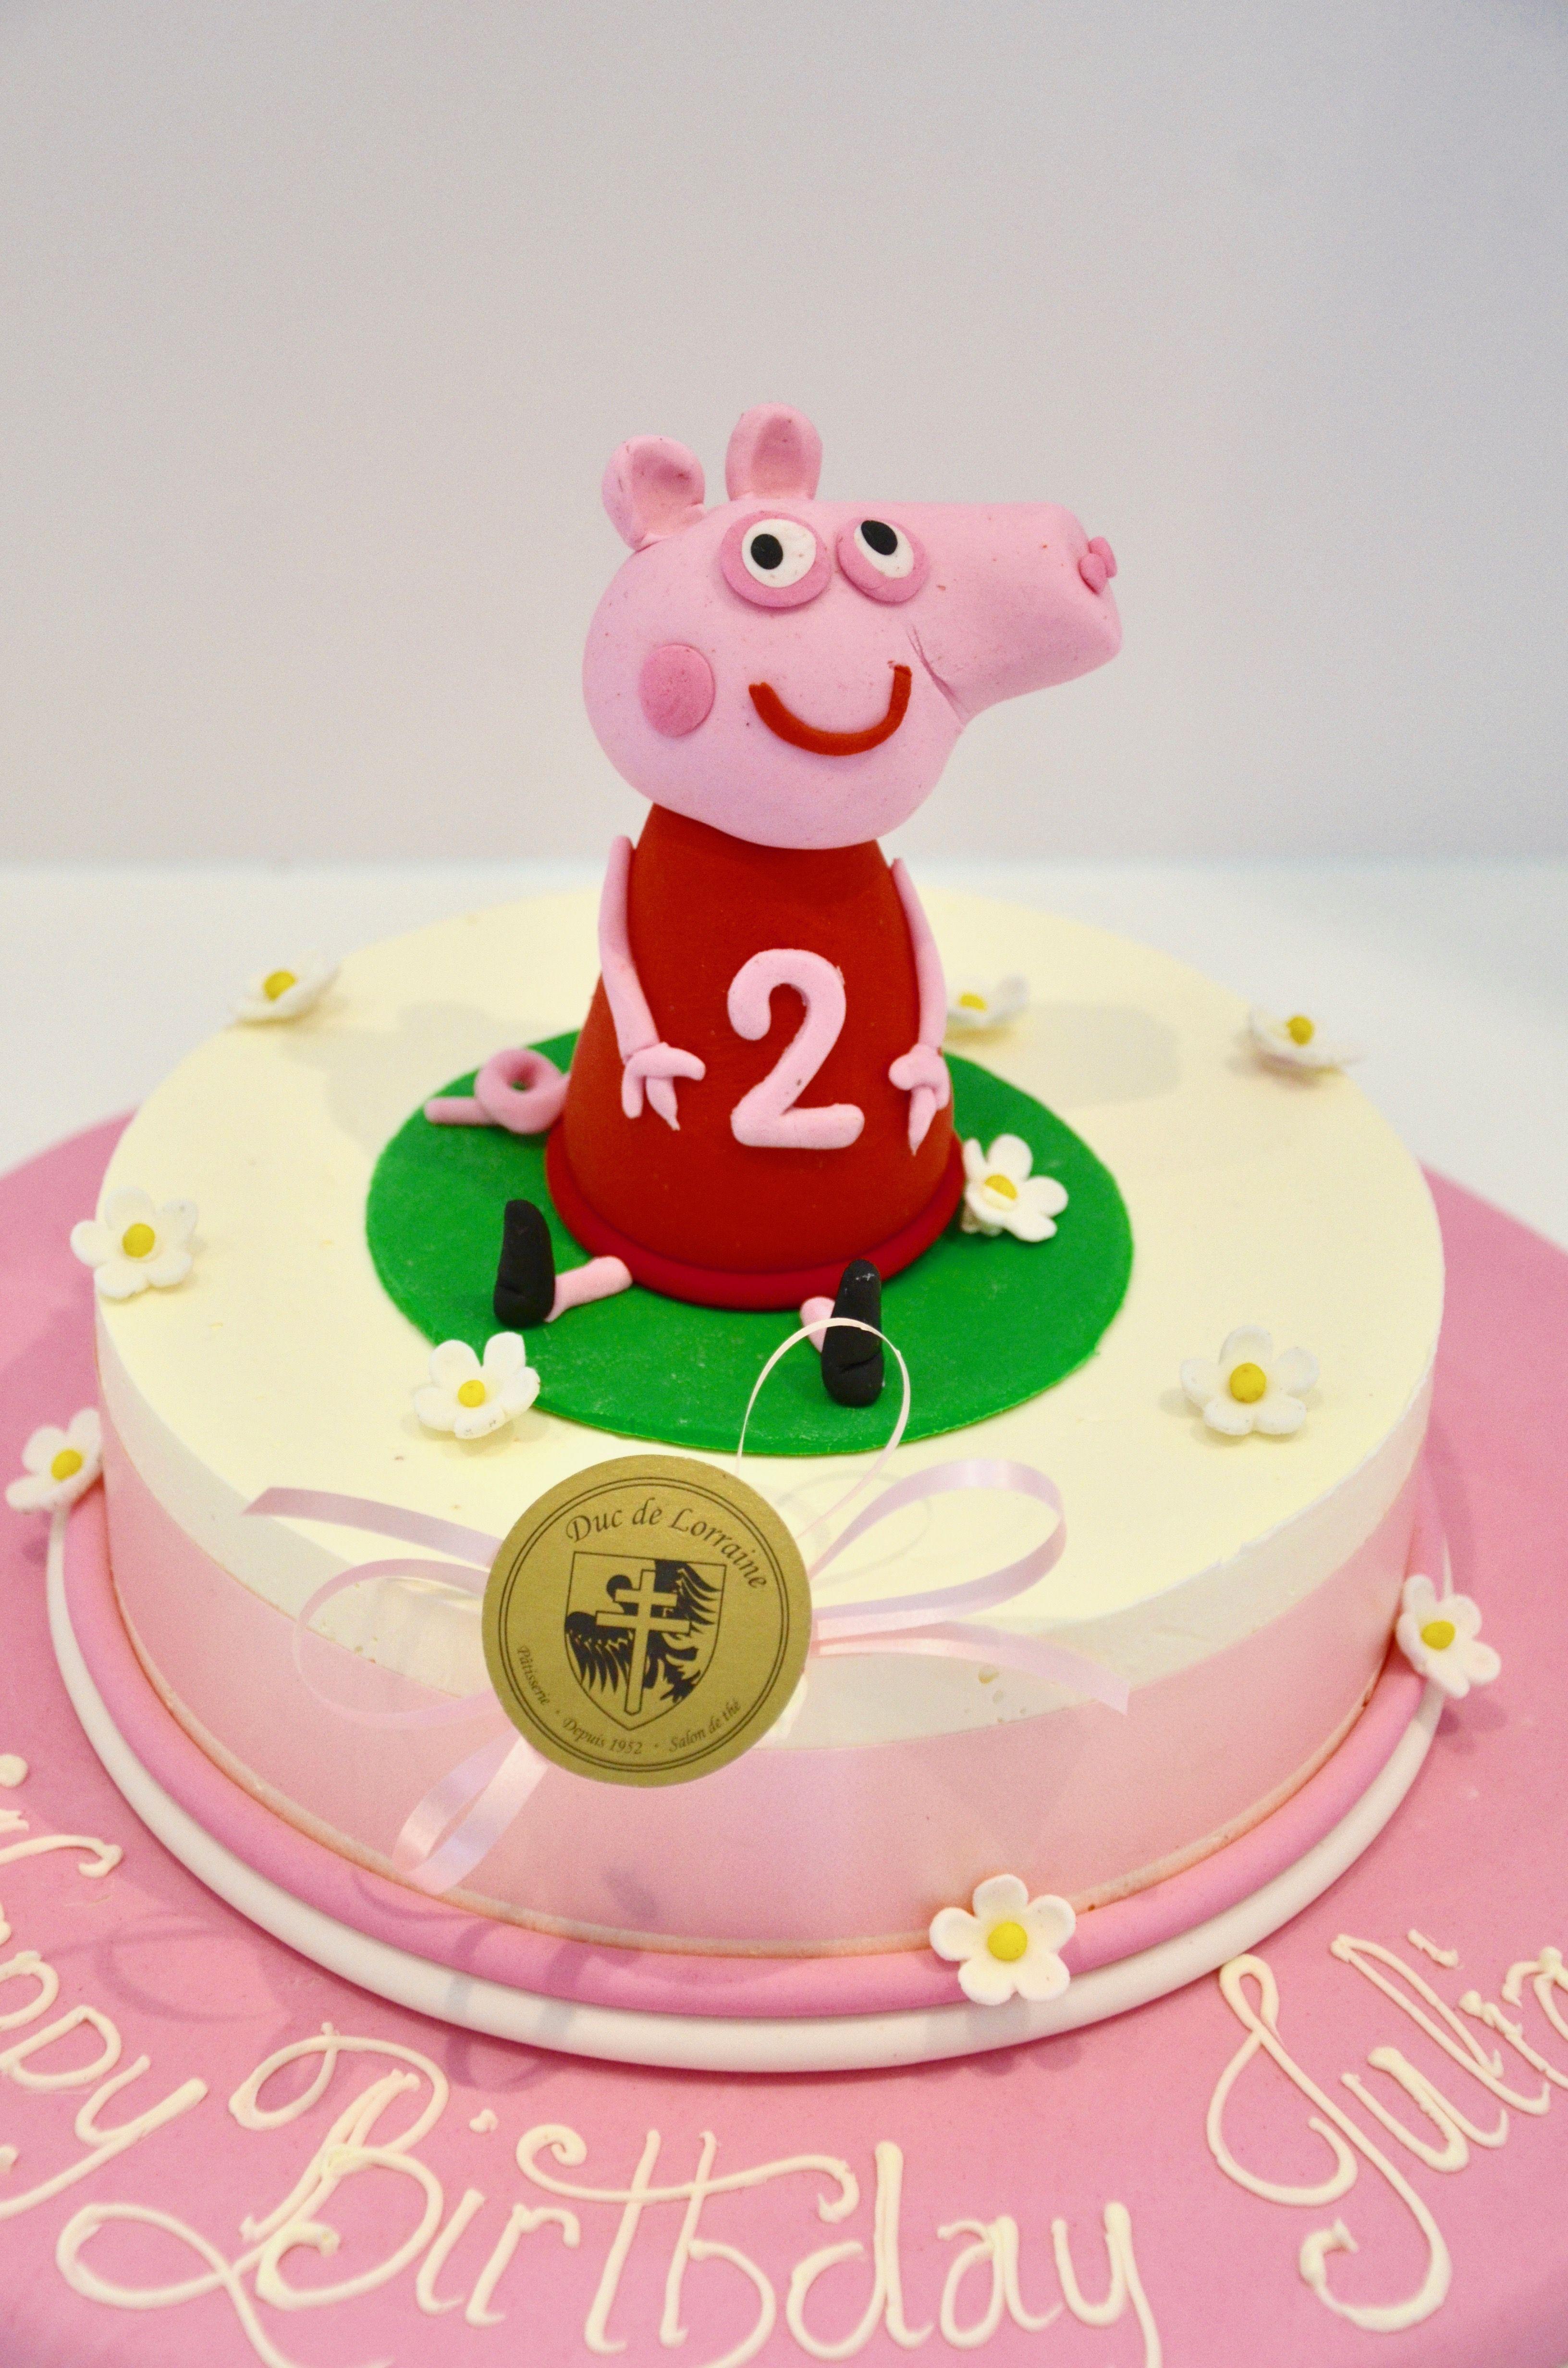 Fabulous Special Orders Custom Birthday Cakes Themed Cakes Custom Cakes Funny Birthday Cards Online Benoljebrpdamsfinfo